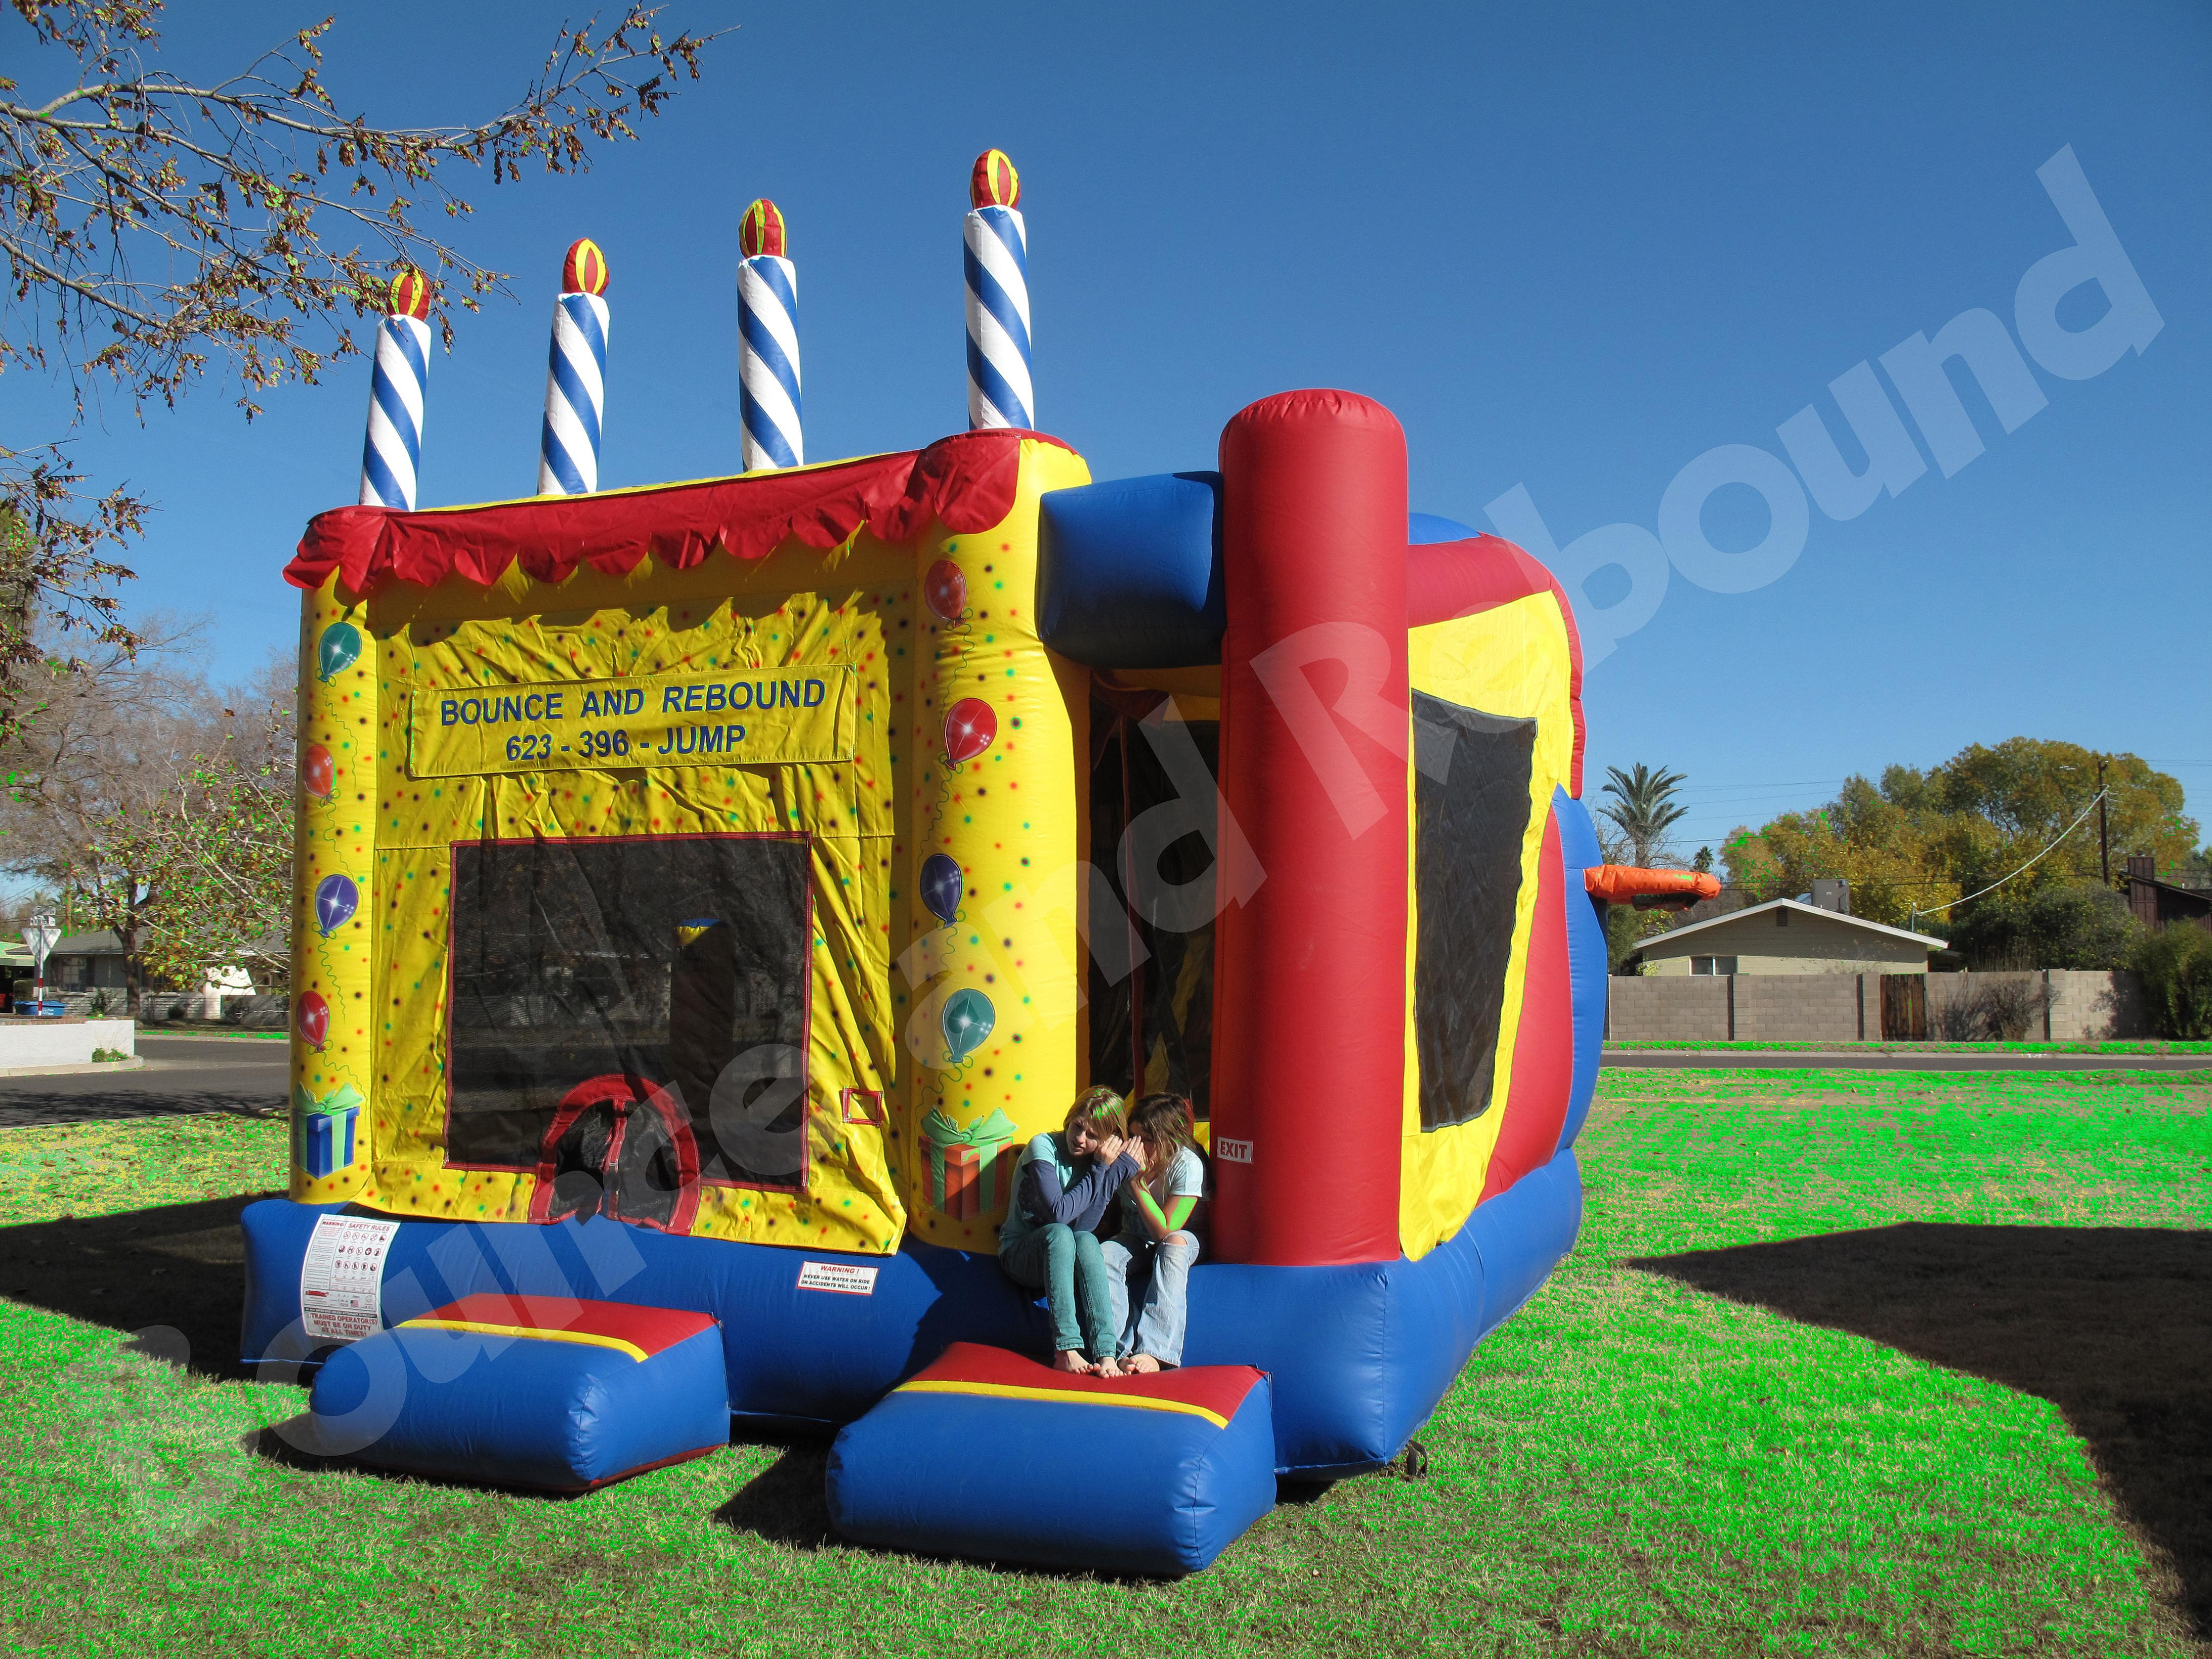 Rebound >> Bounce House Rentals AZ, Arizona Bounce Houses, Party Rentals Phoenix | Birthday Cake 5-in-1 ...